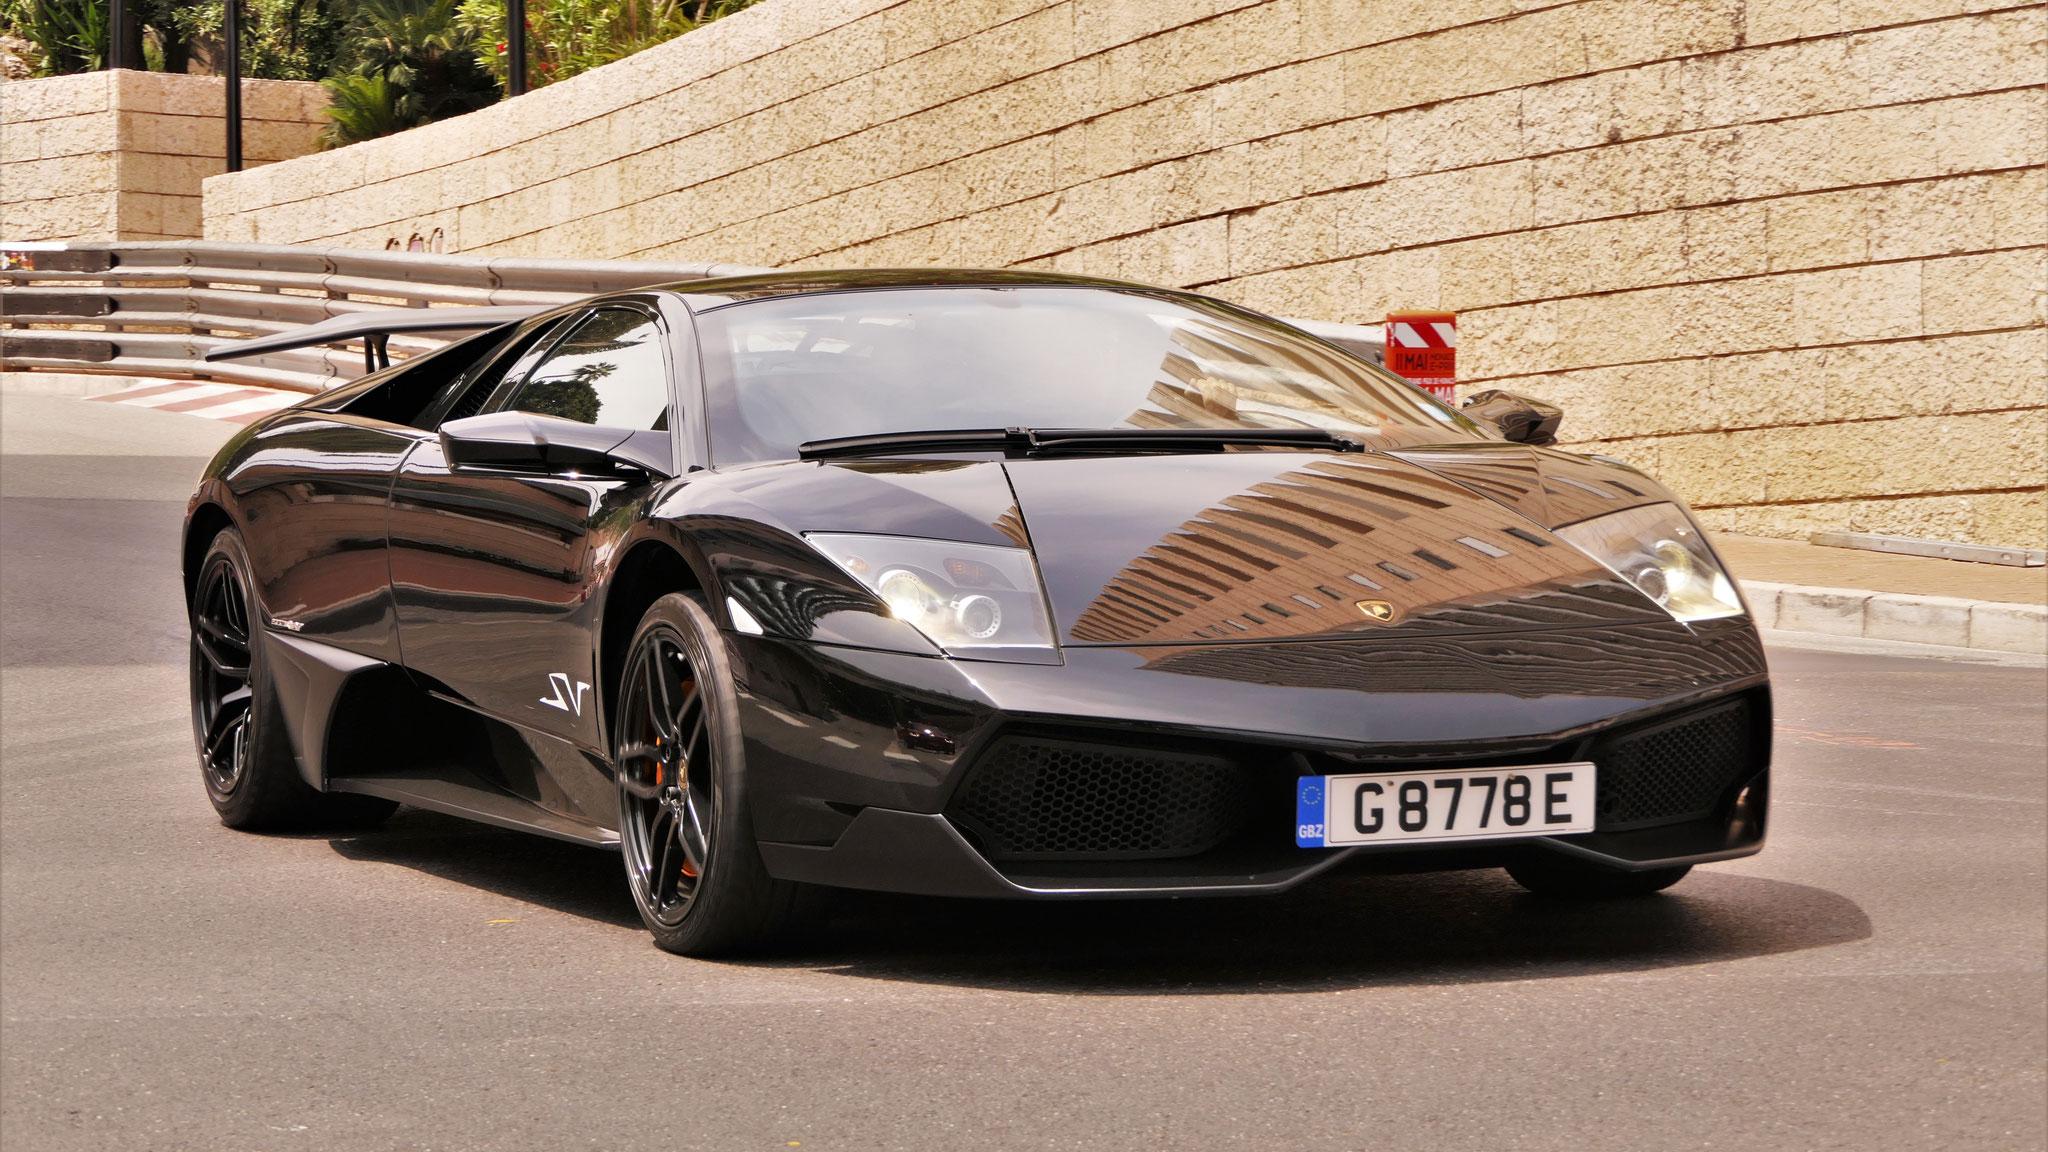 Lamborghini Murcielago SV - G-8778-E (GBZ)